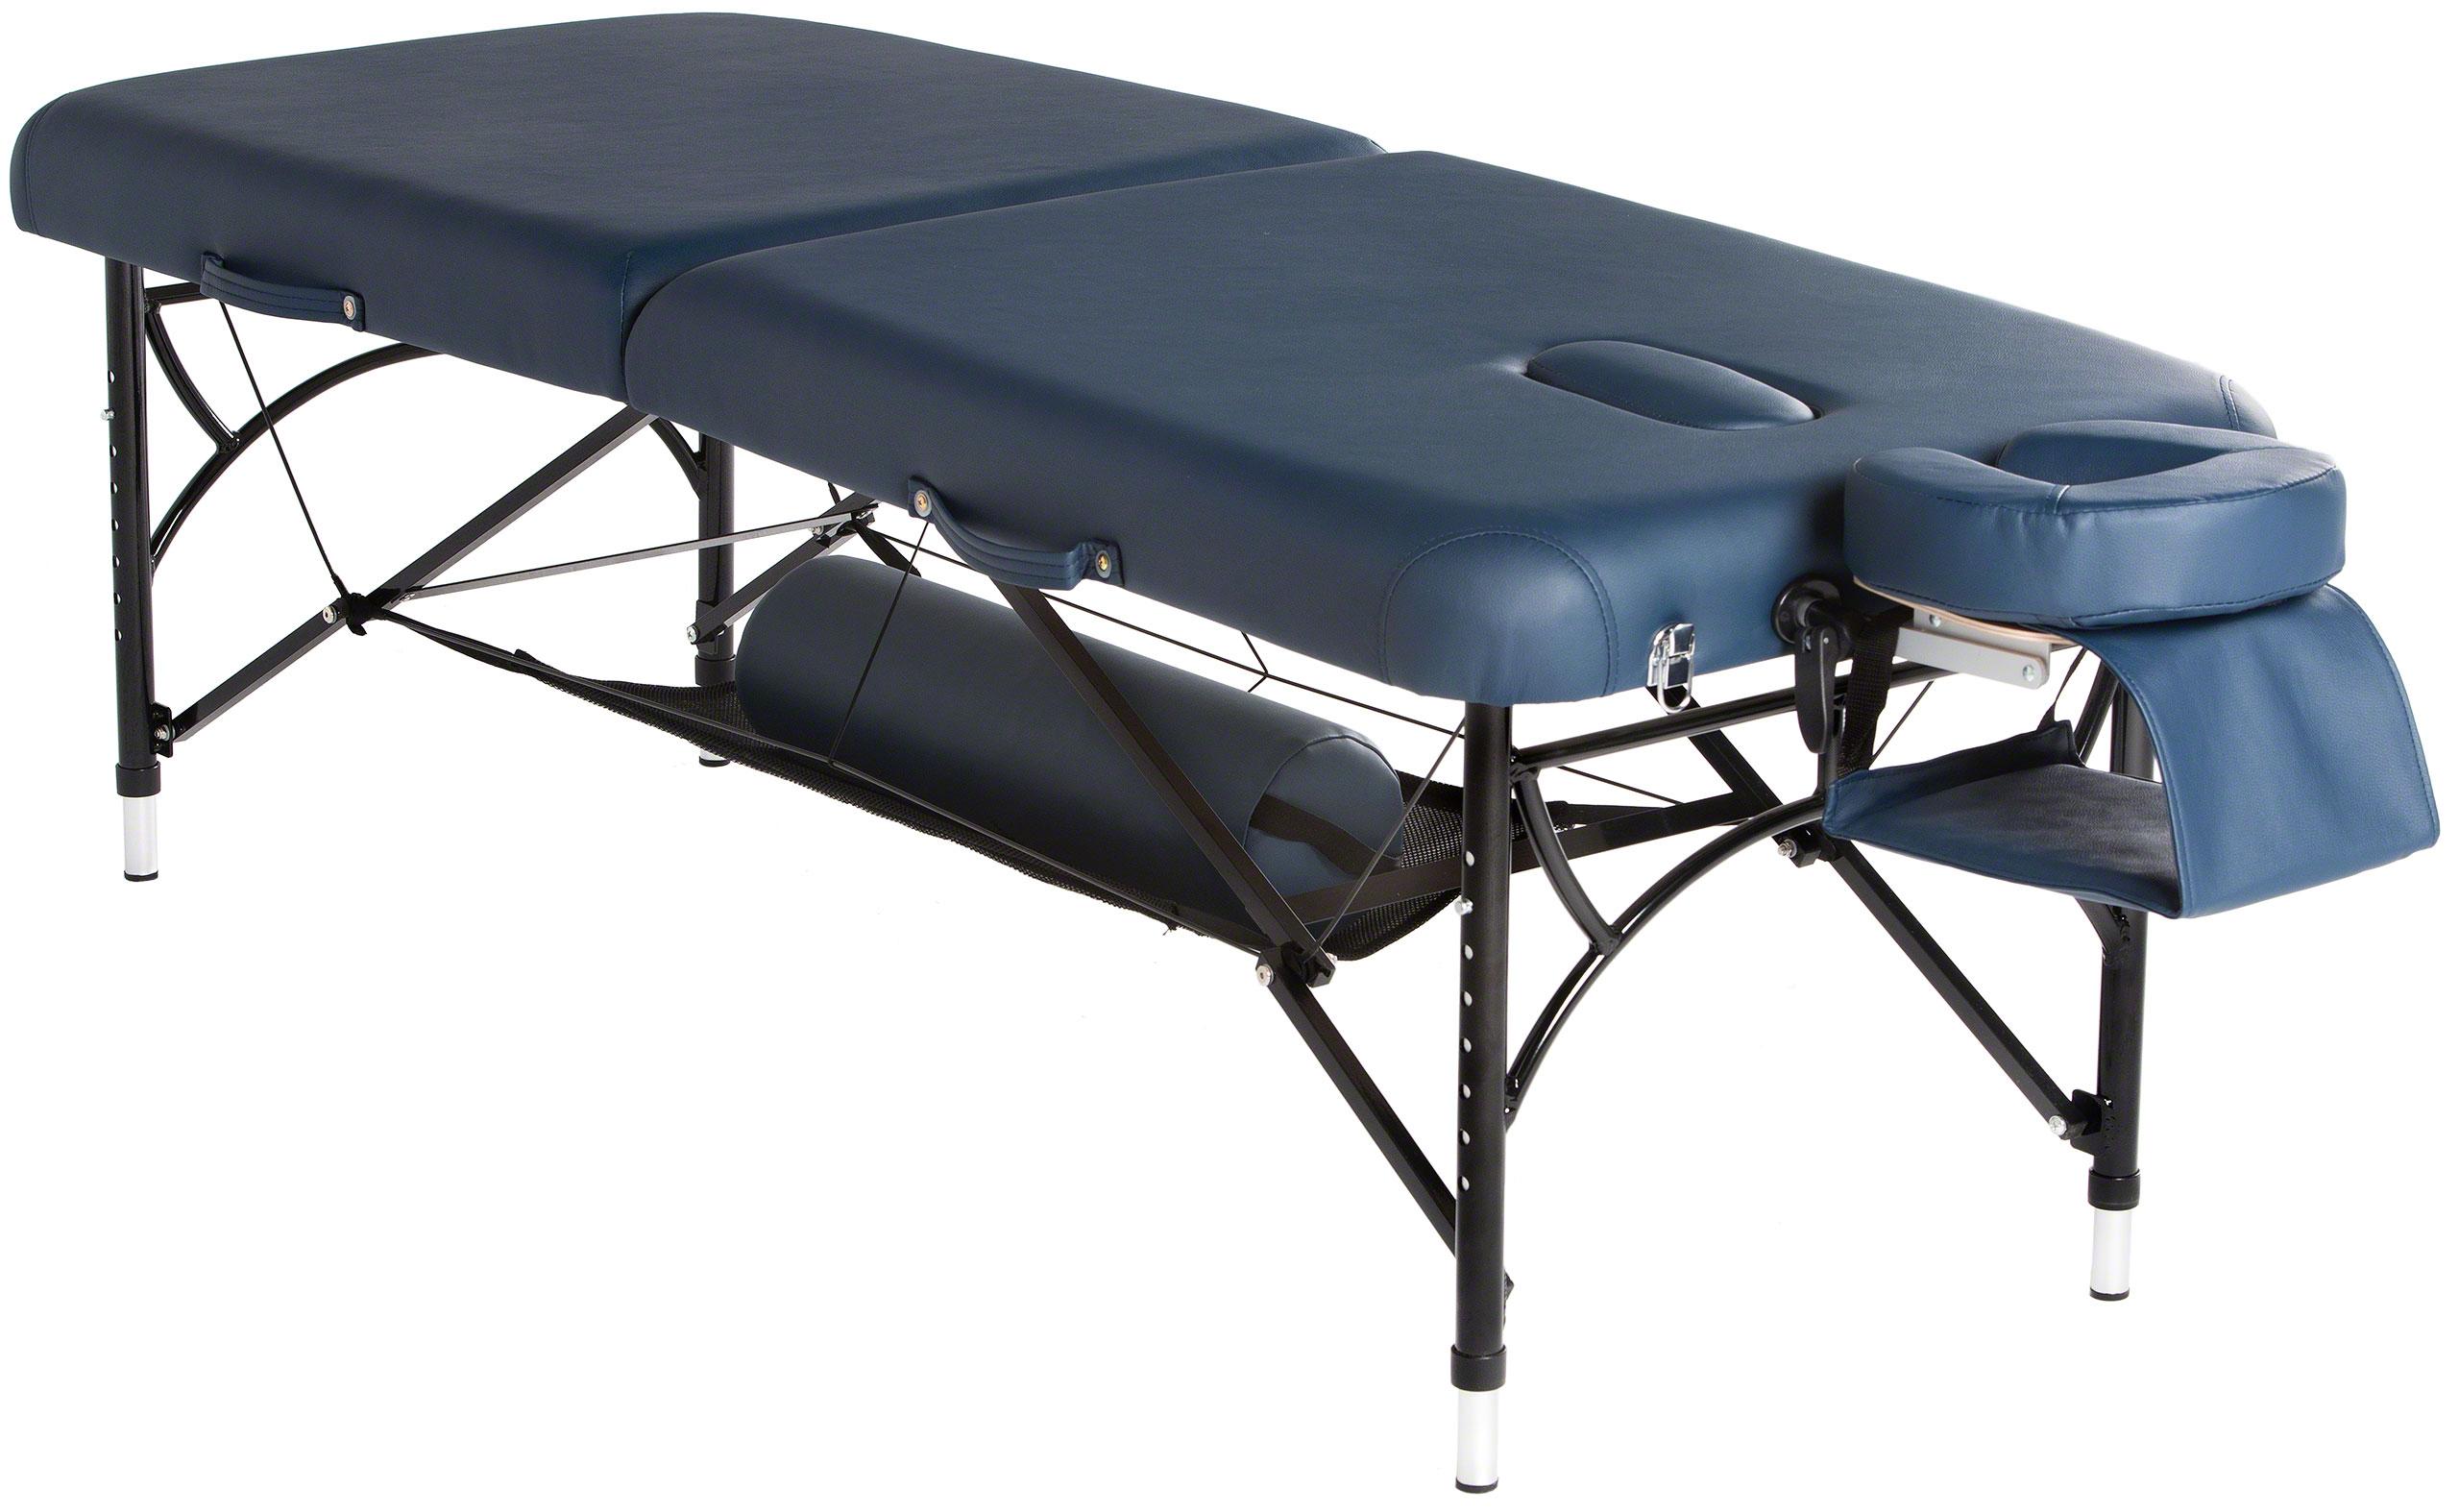 BodyPro Deluxe Active Lightweight Massage Table